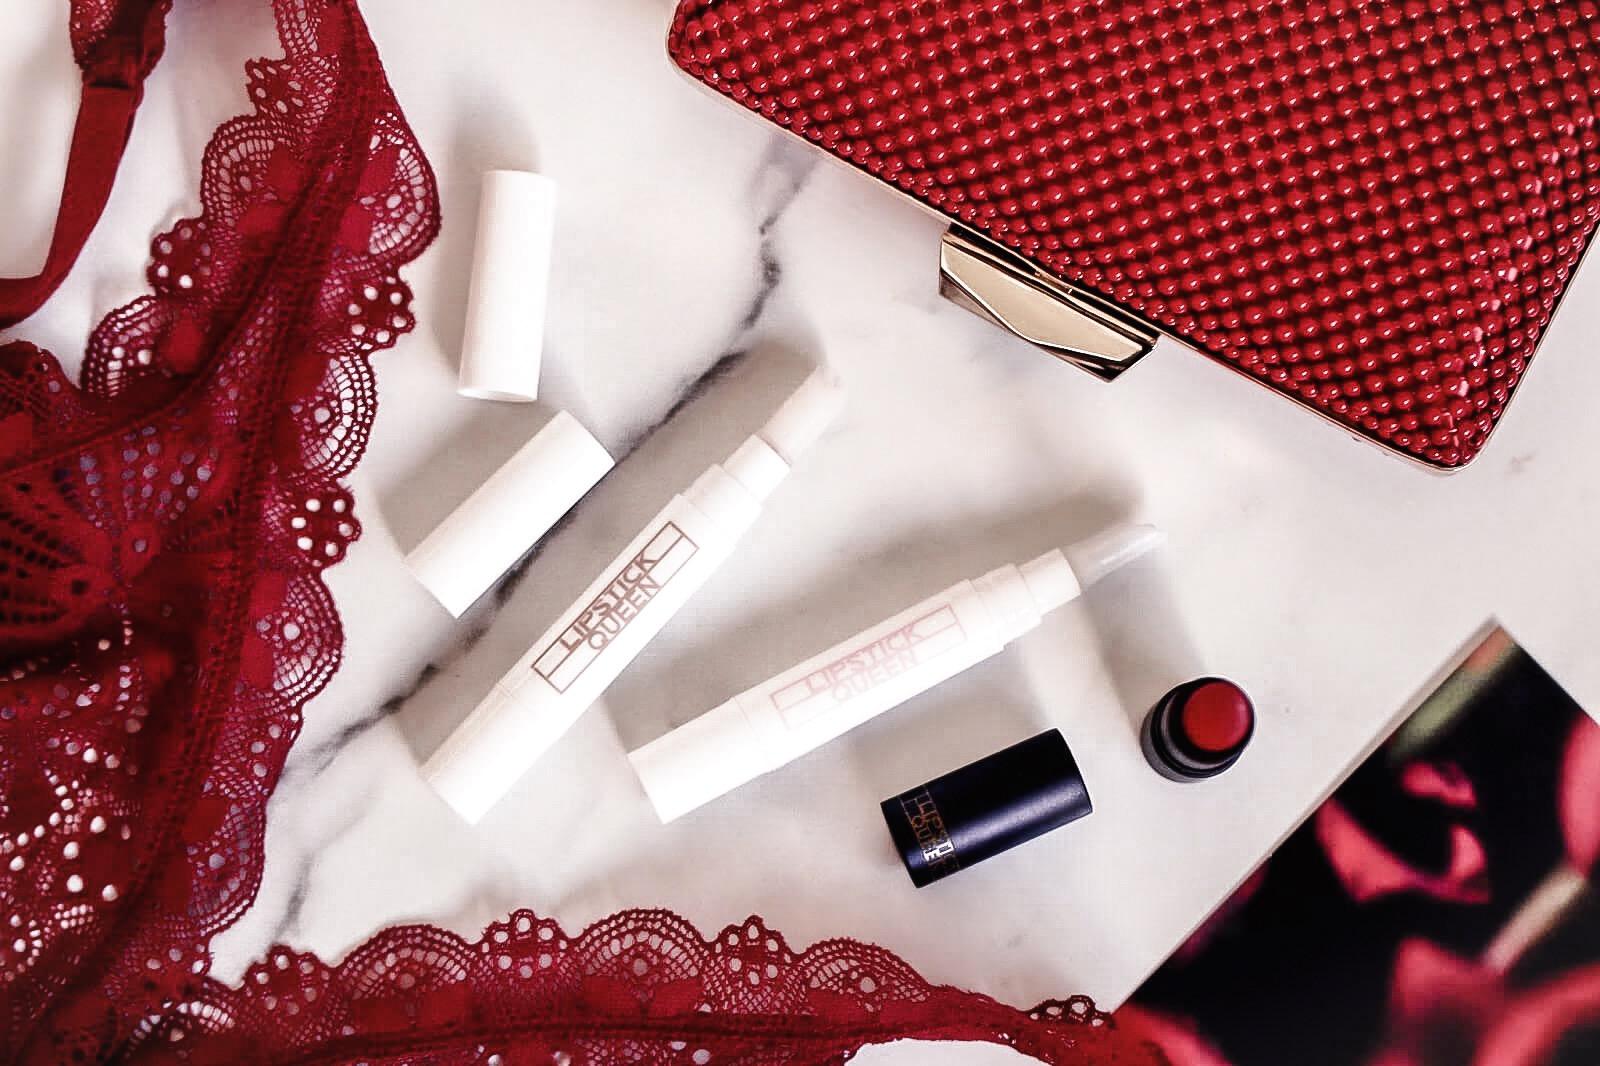 lipstick-queen-lip-restore-balm-scrub-baume-à-lèvres-exfoliant-avis-test